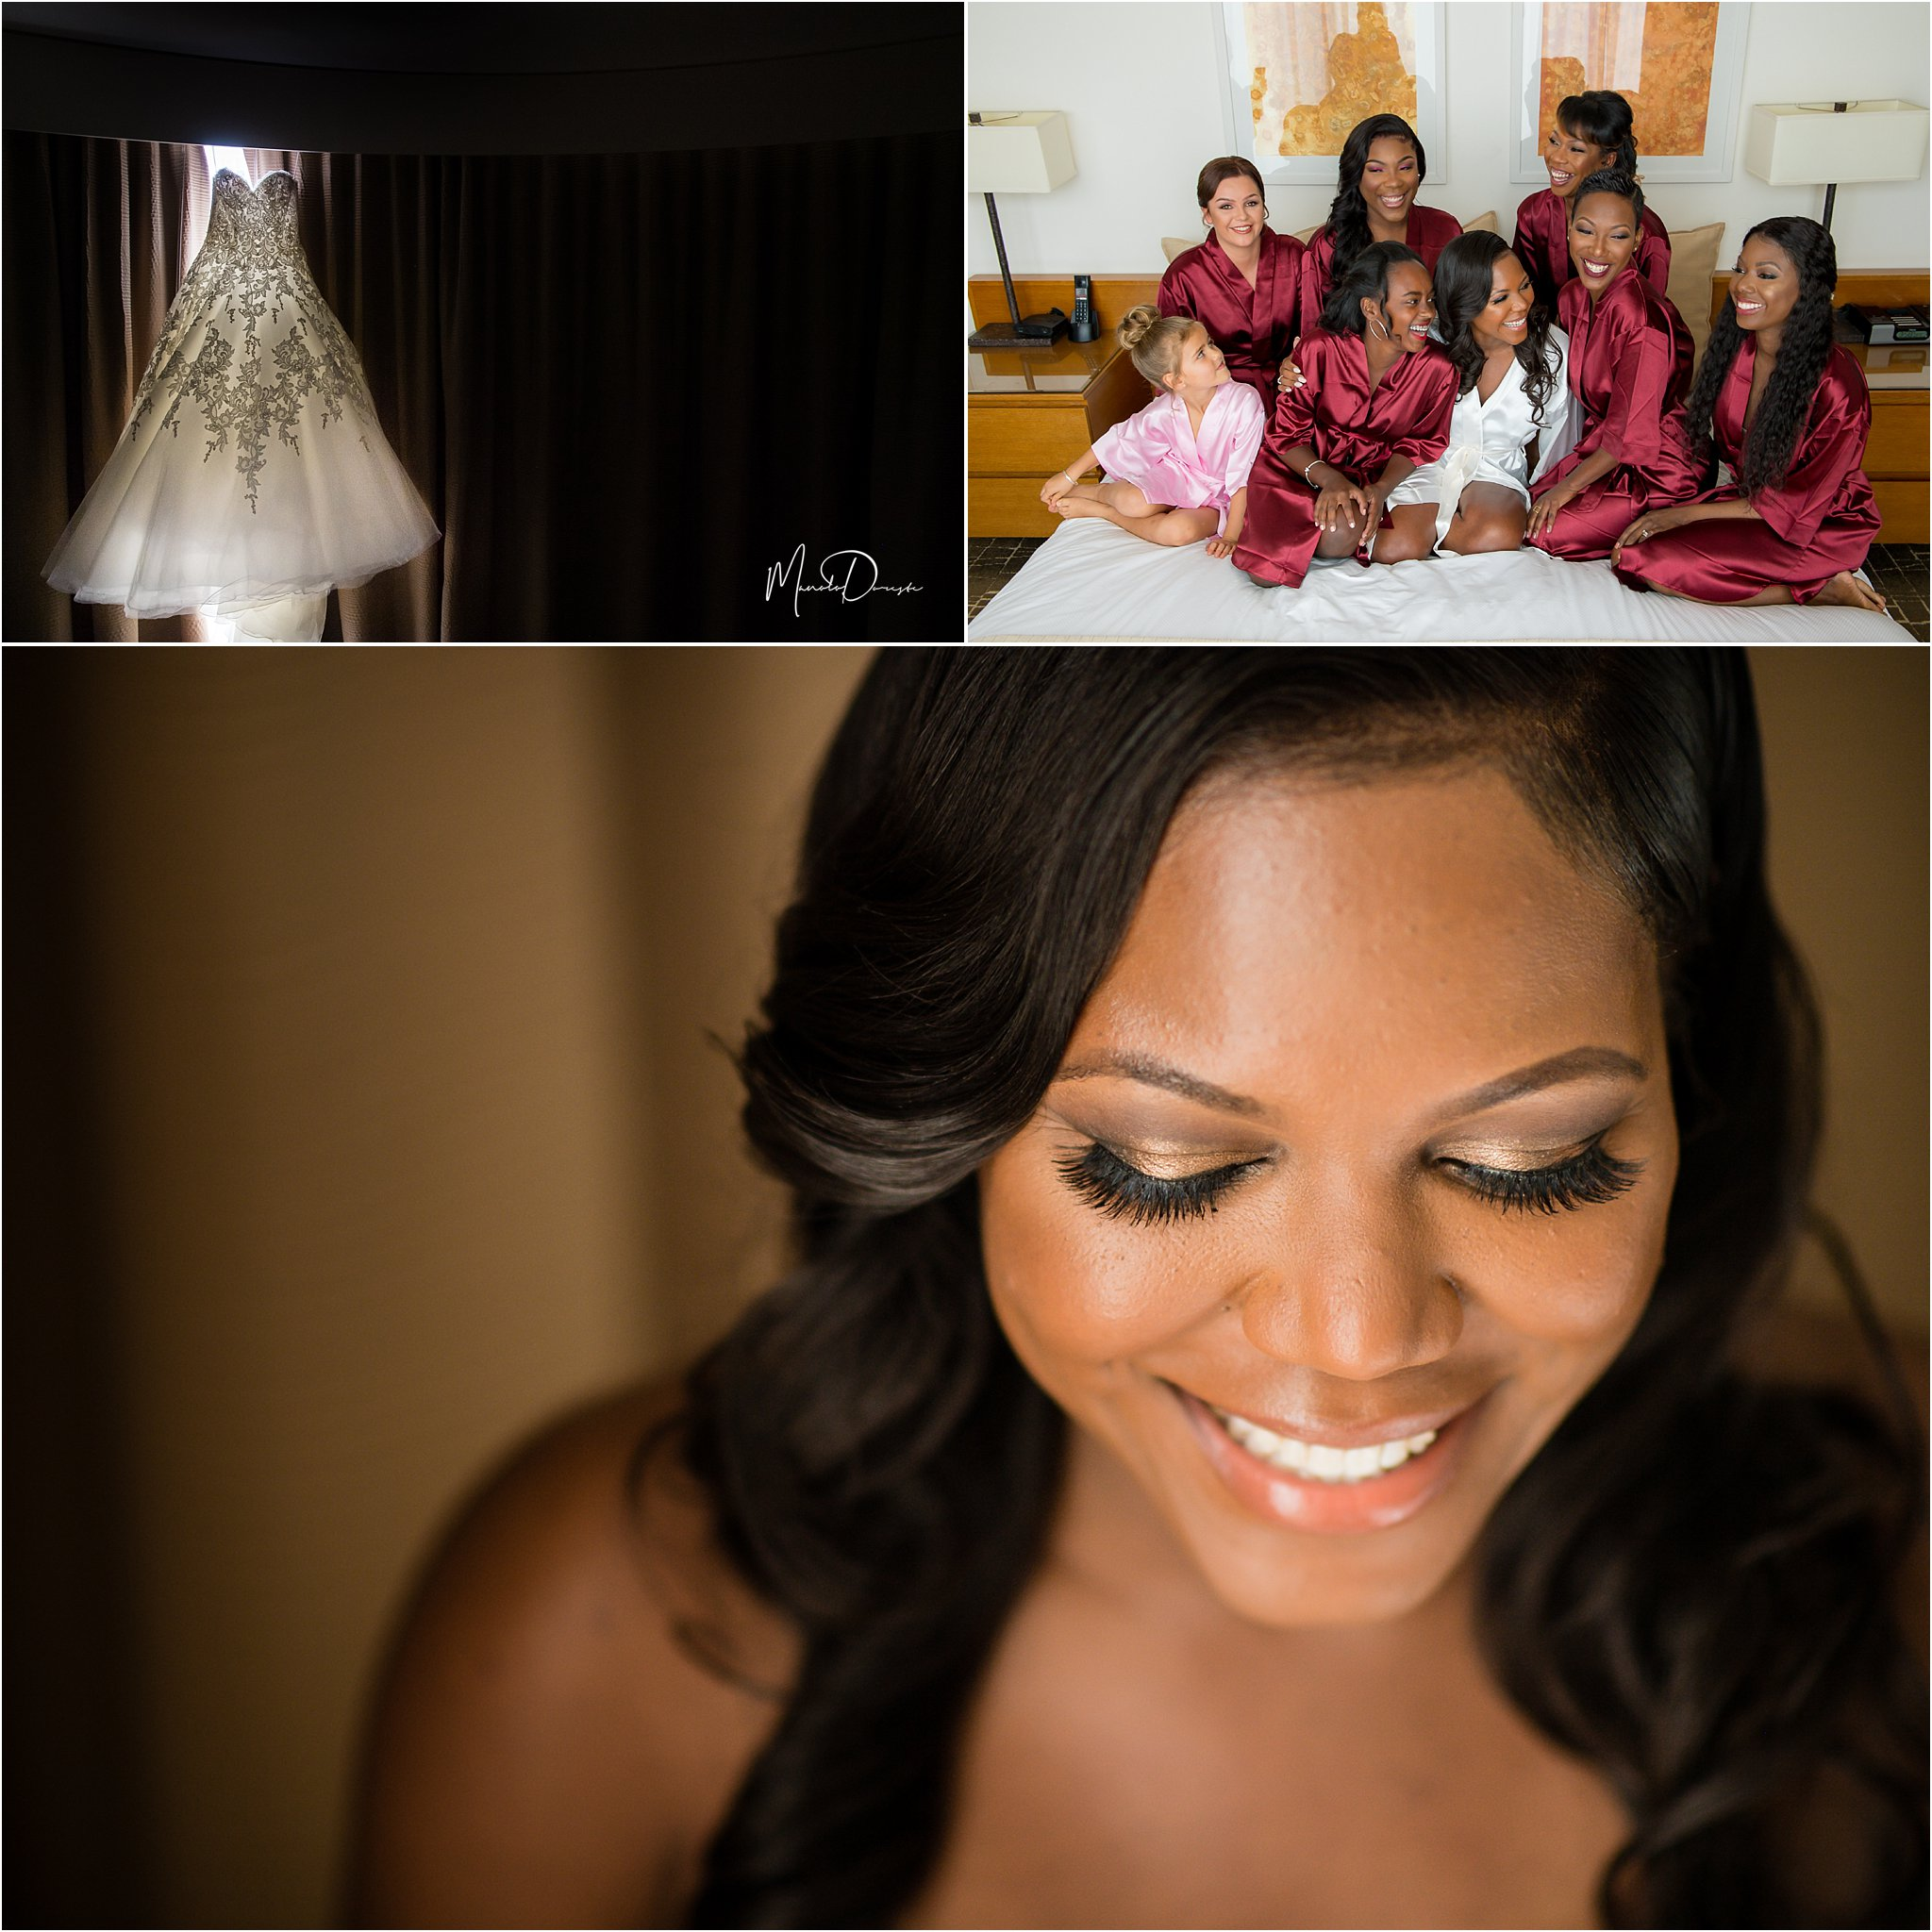 0113_ManoloDoreste_InFocusStudios_Wedding_Family_Photography_Miami_MiamiPhotographer.jpg